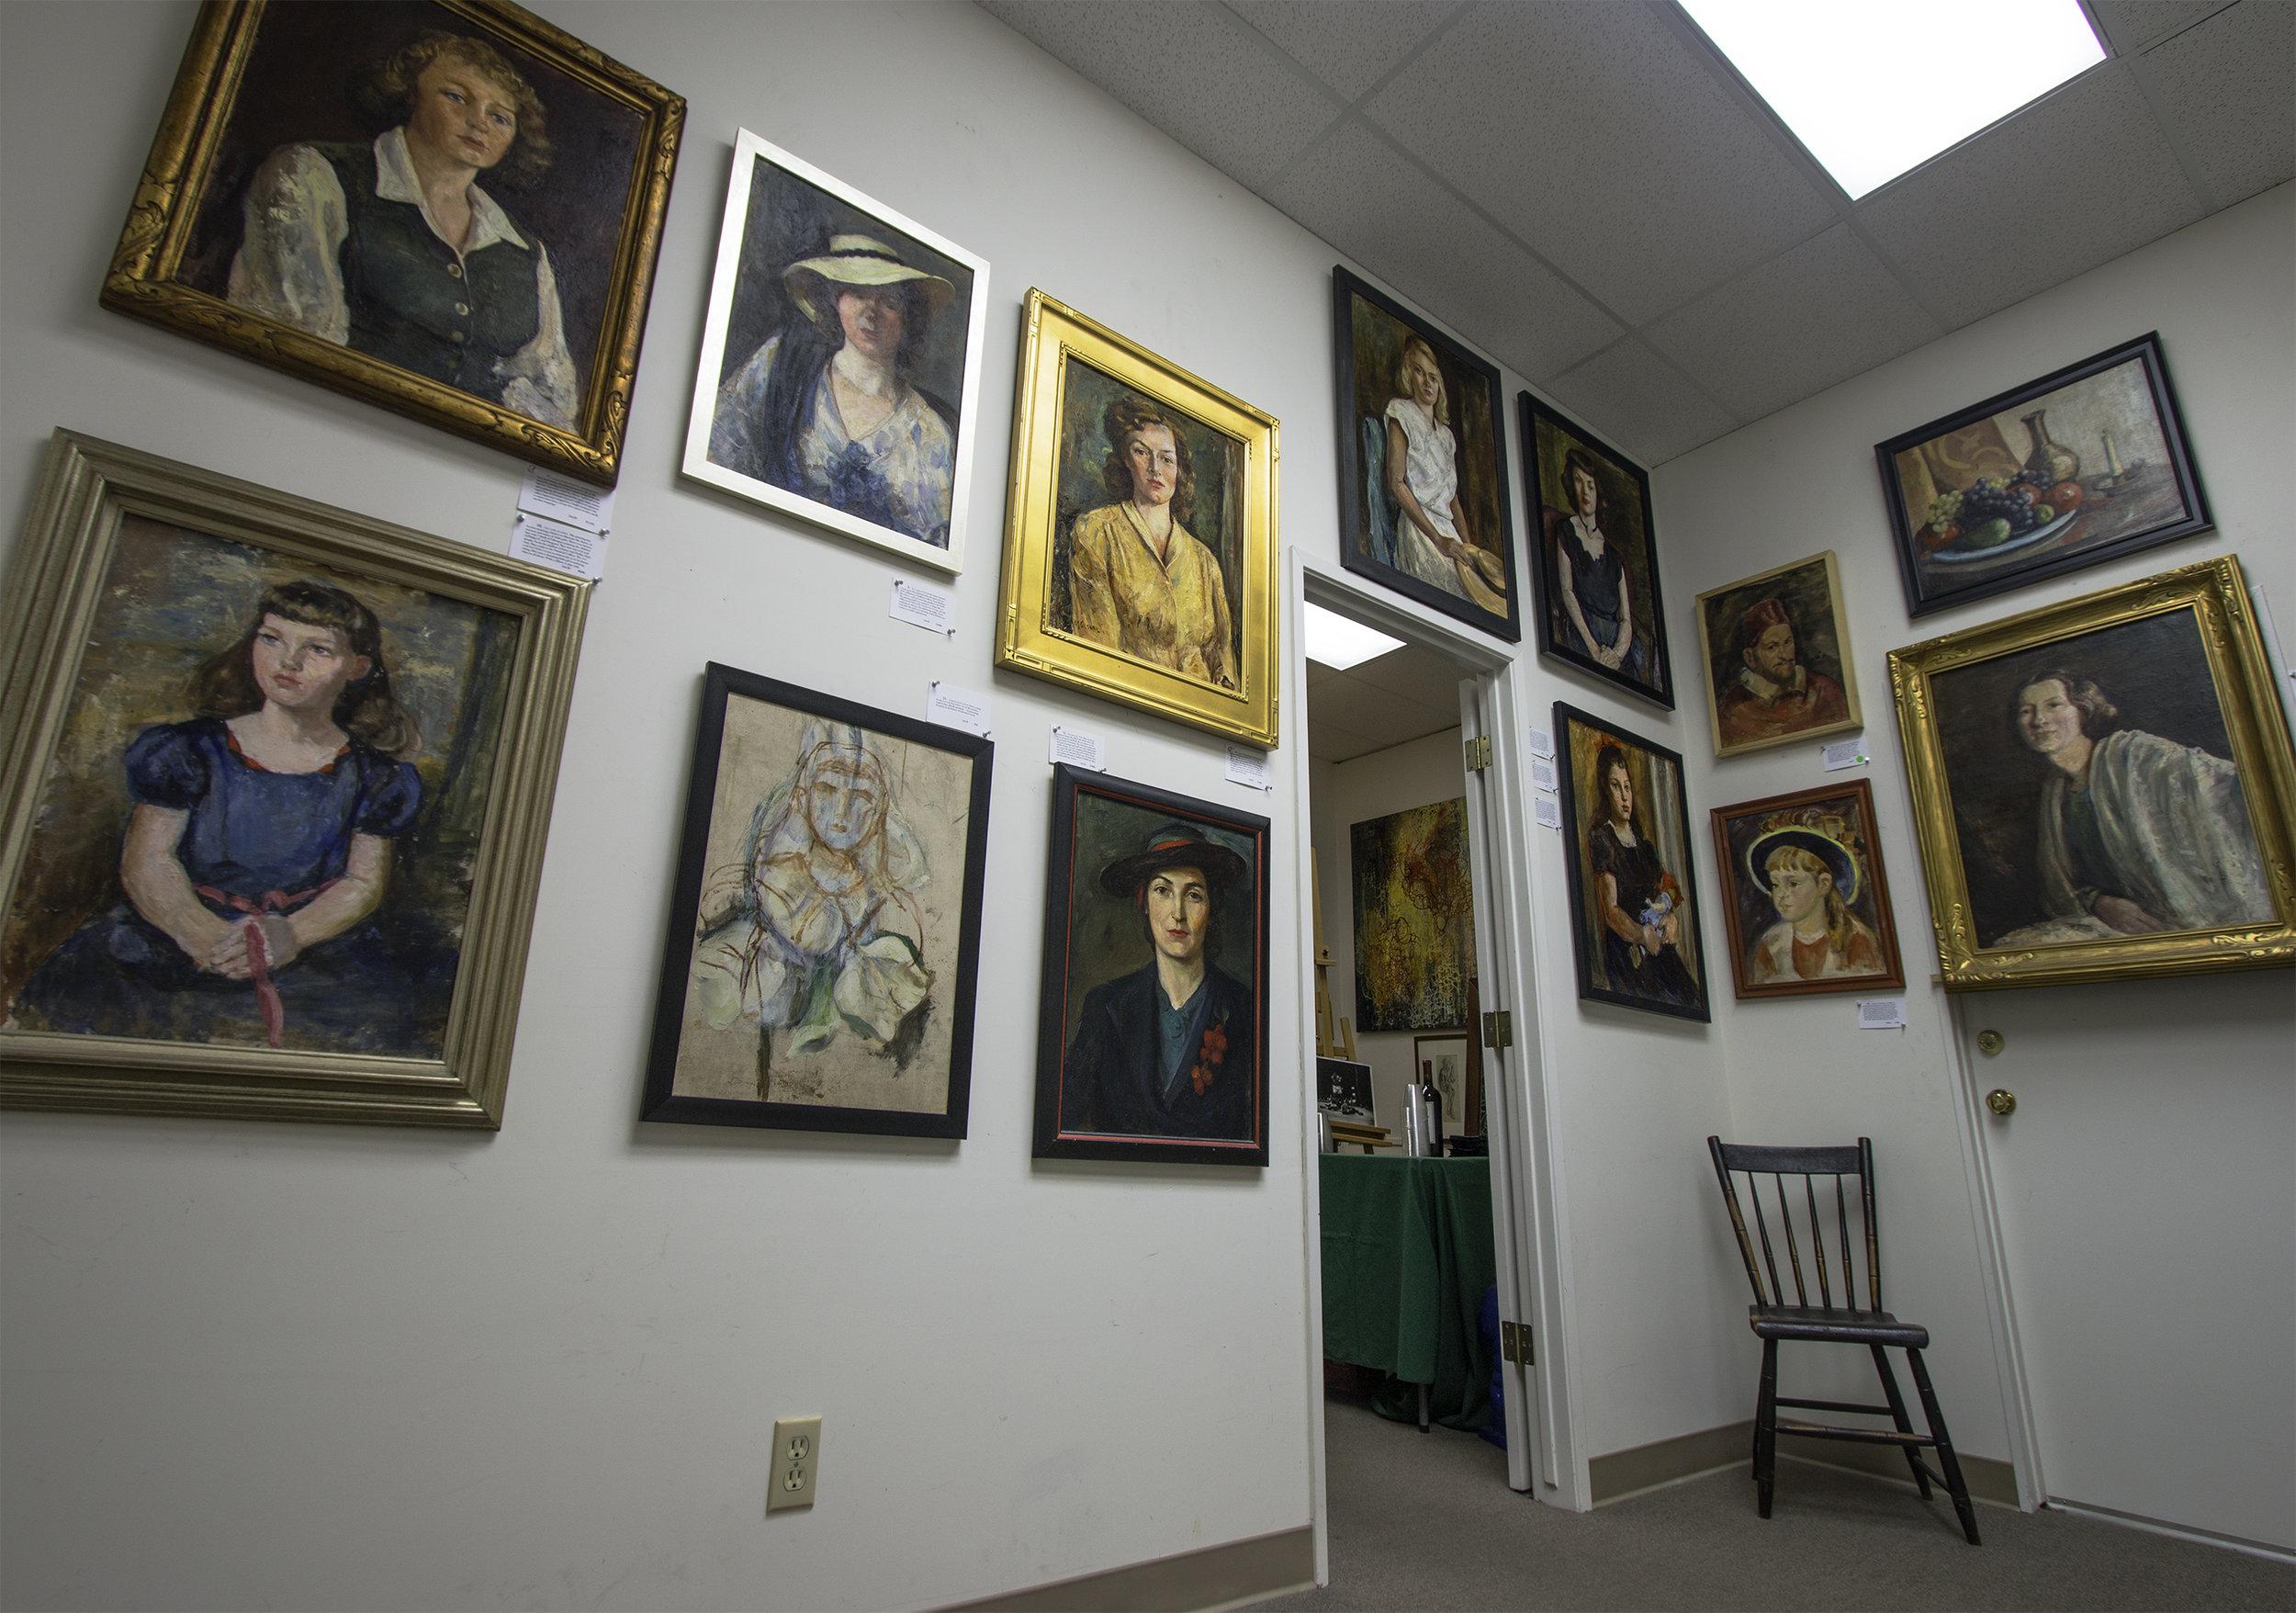 Gallery show of Antonia Greene paintings, January 201 8.